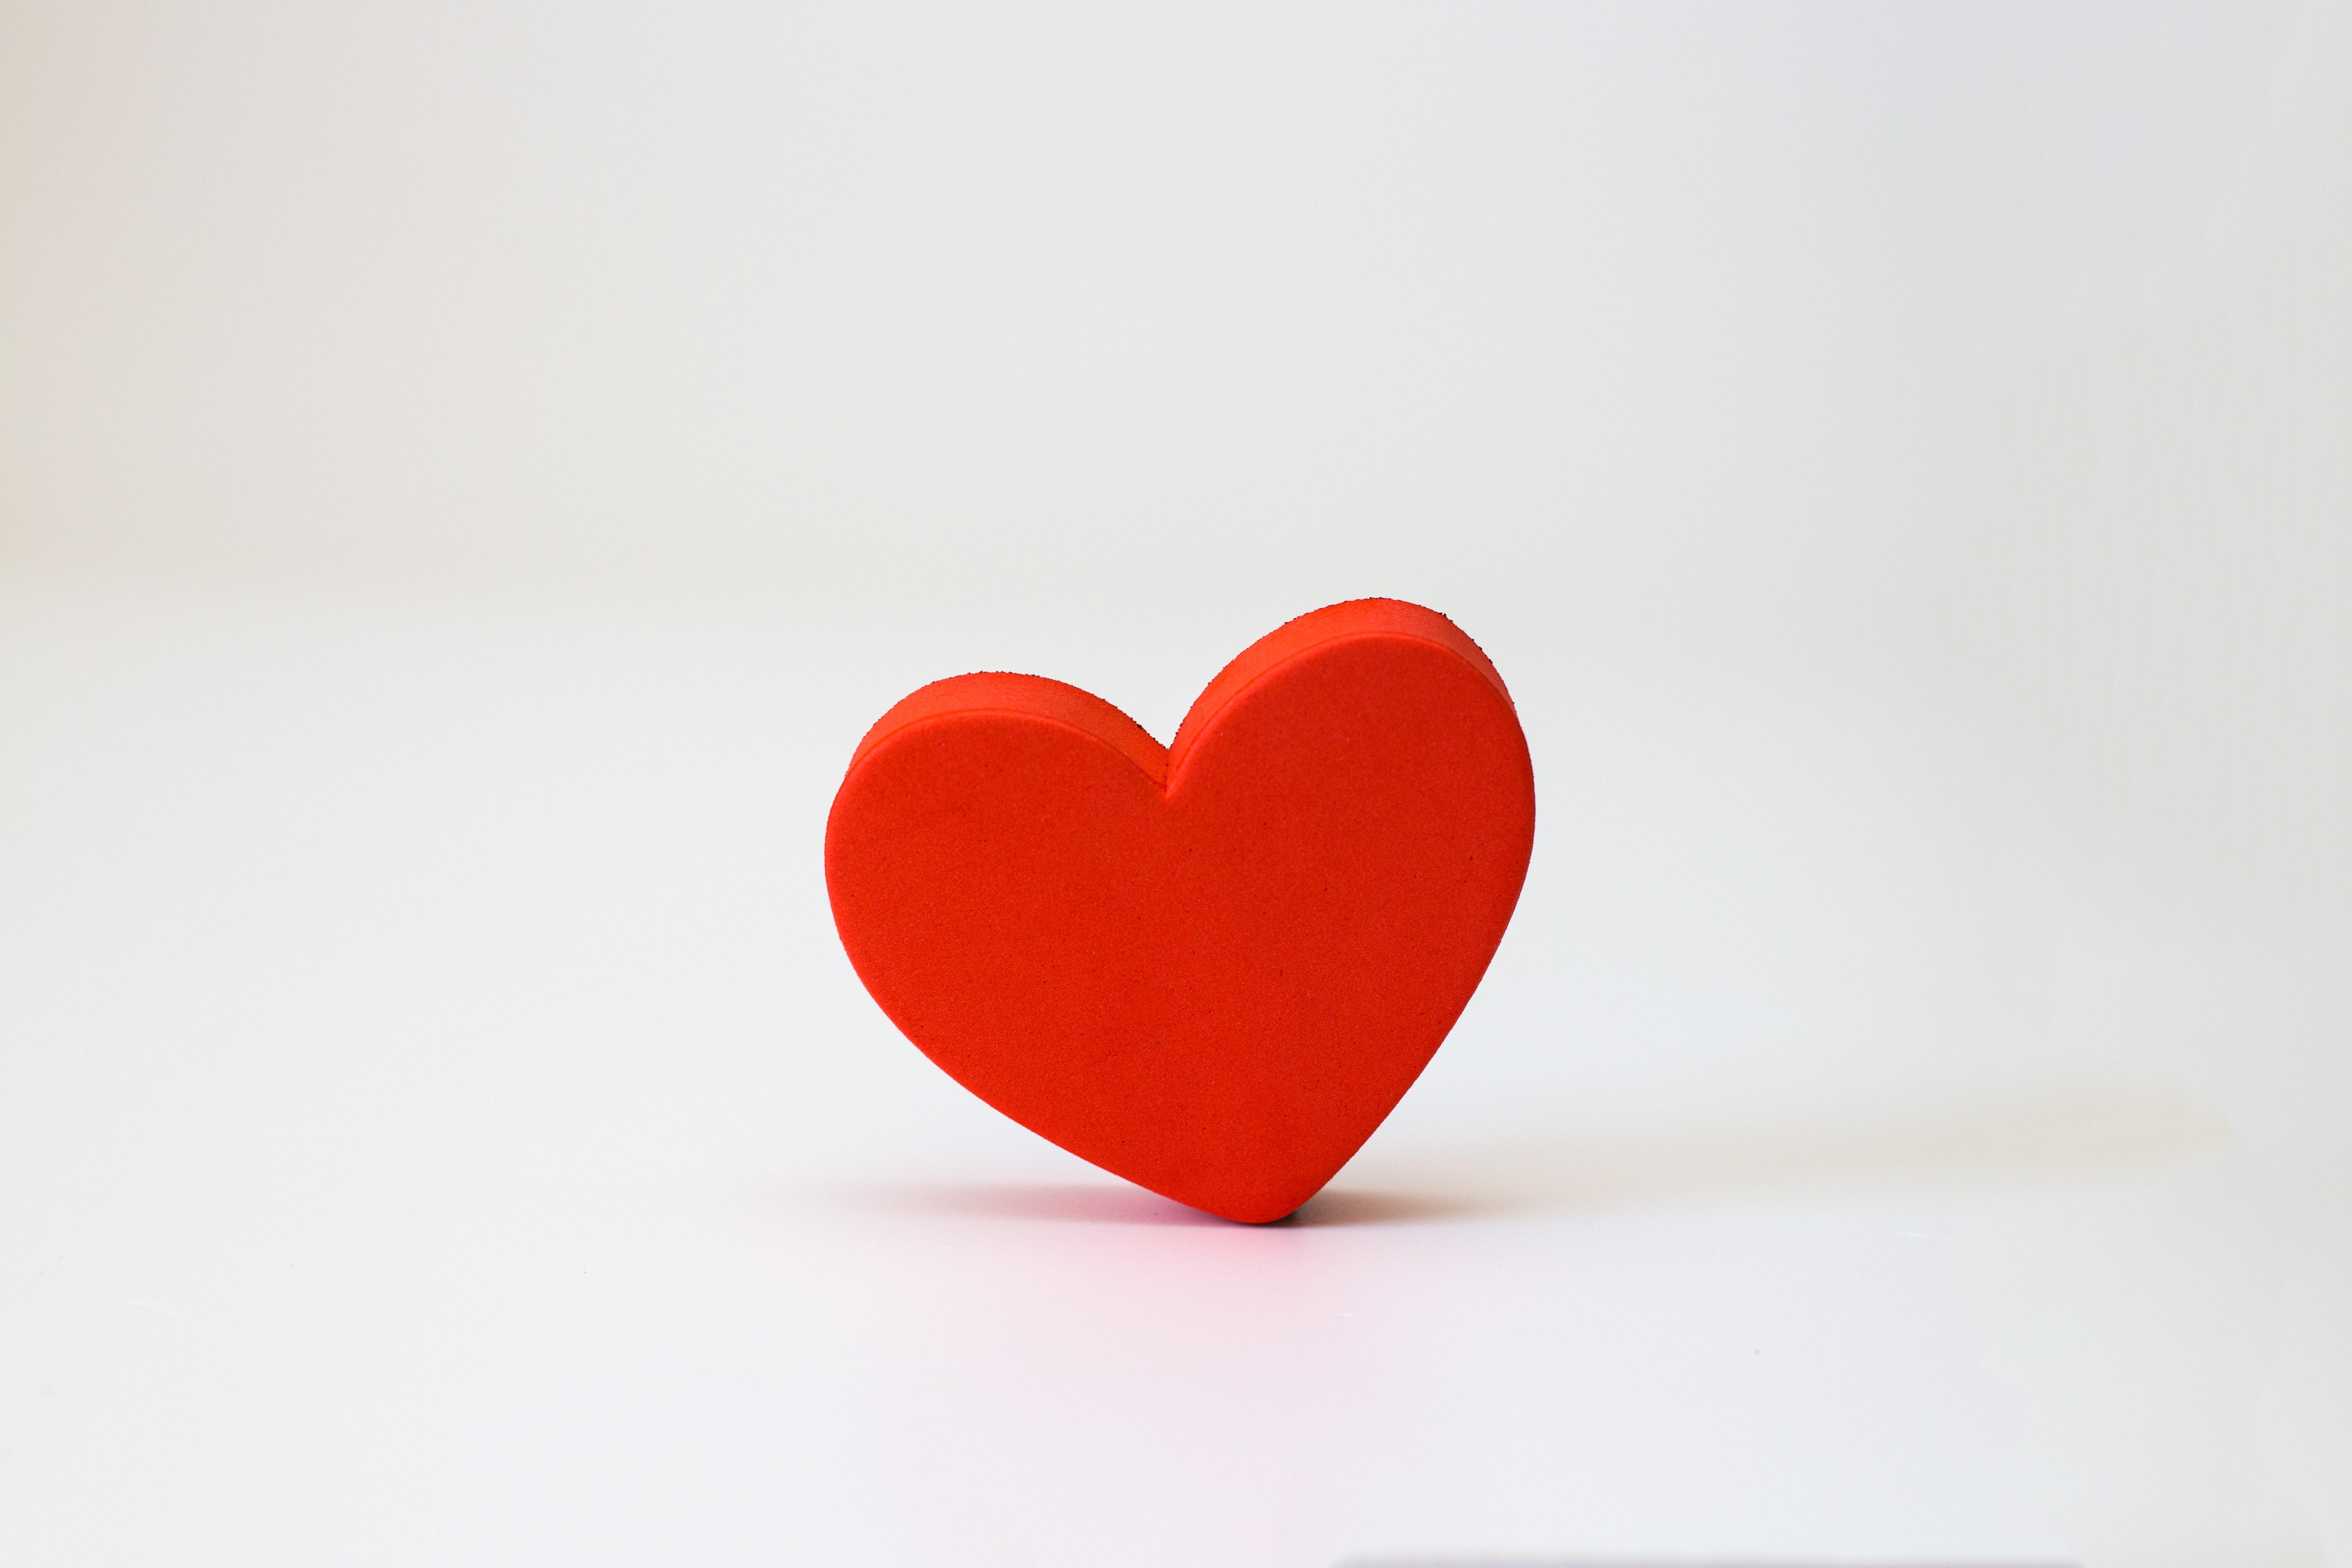 Free Stock Photo Of Heart Love Love Symbol